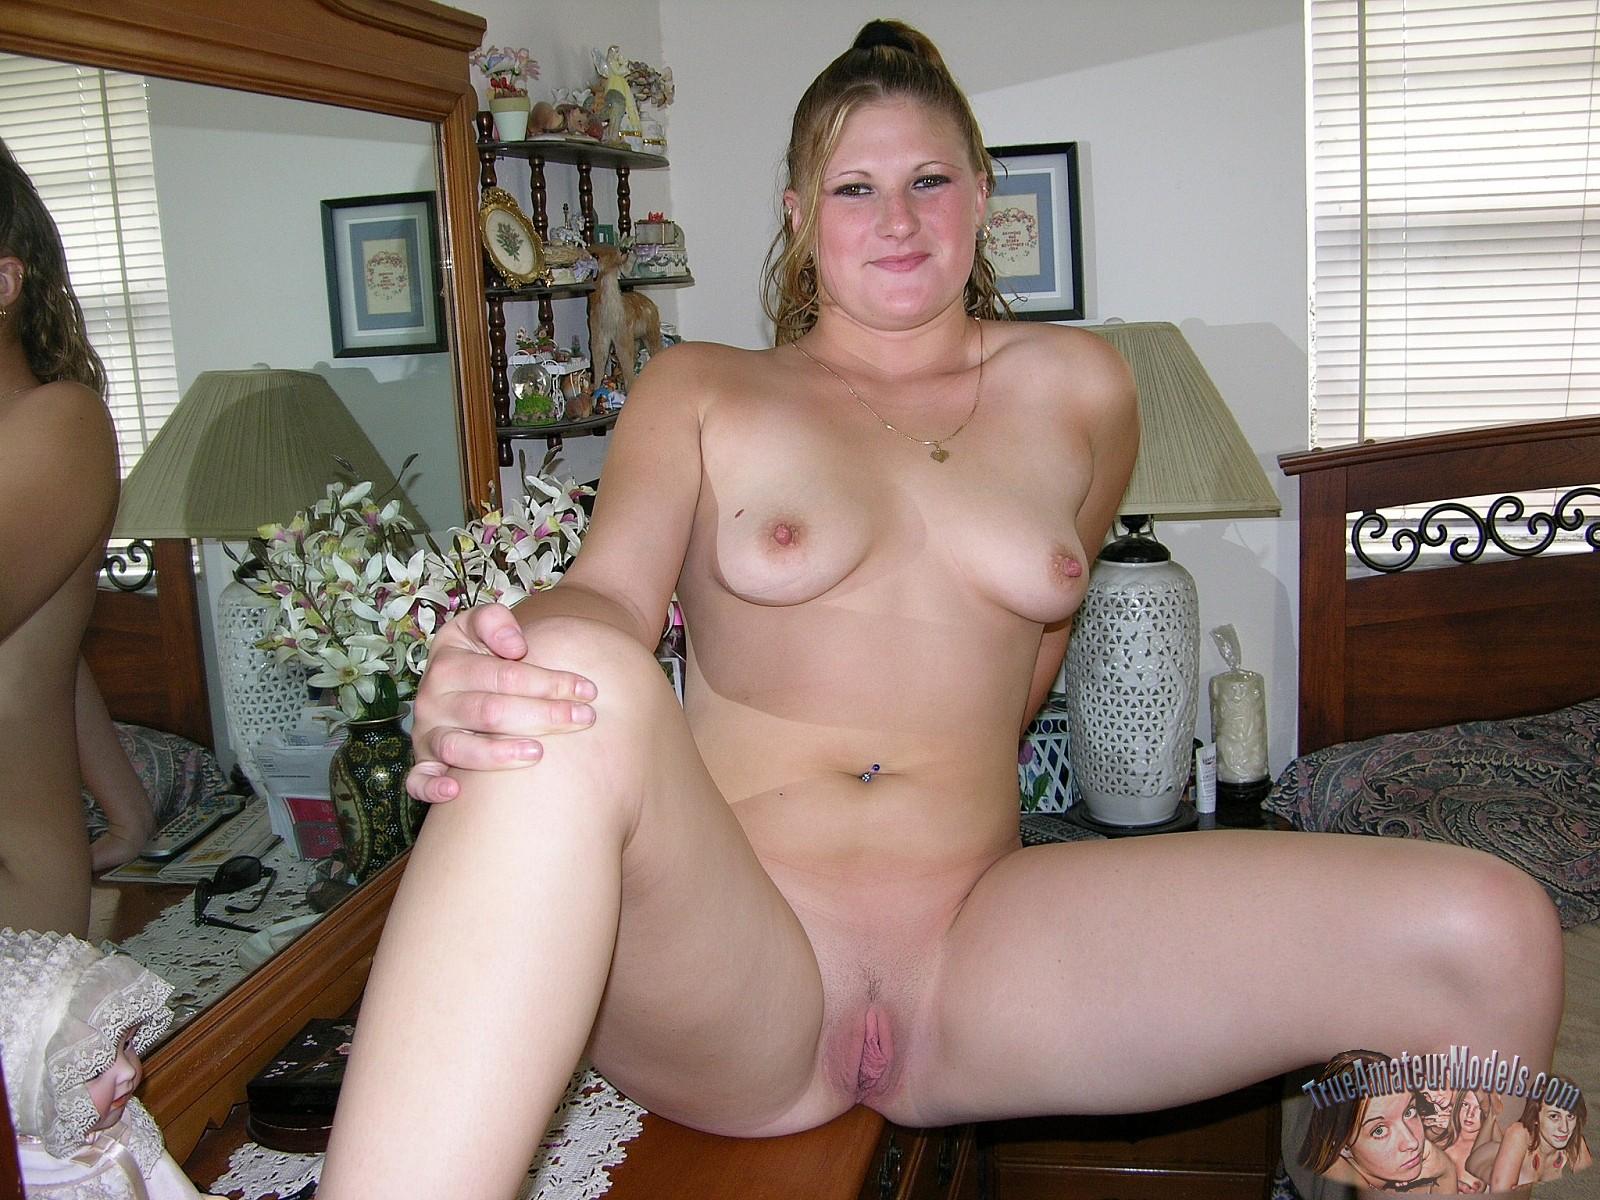 Crissy moran hardcore lesbian